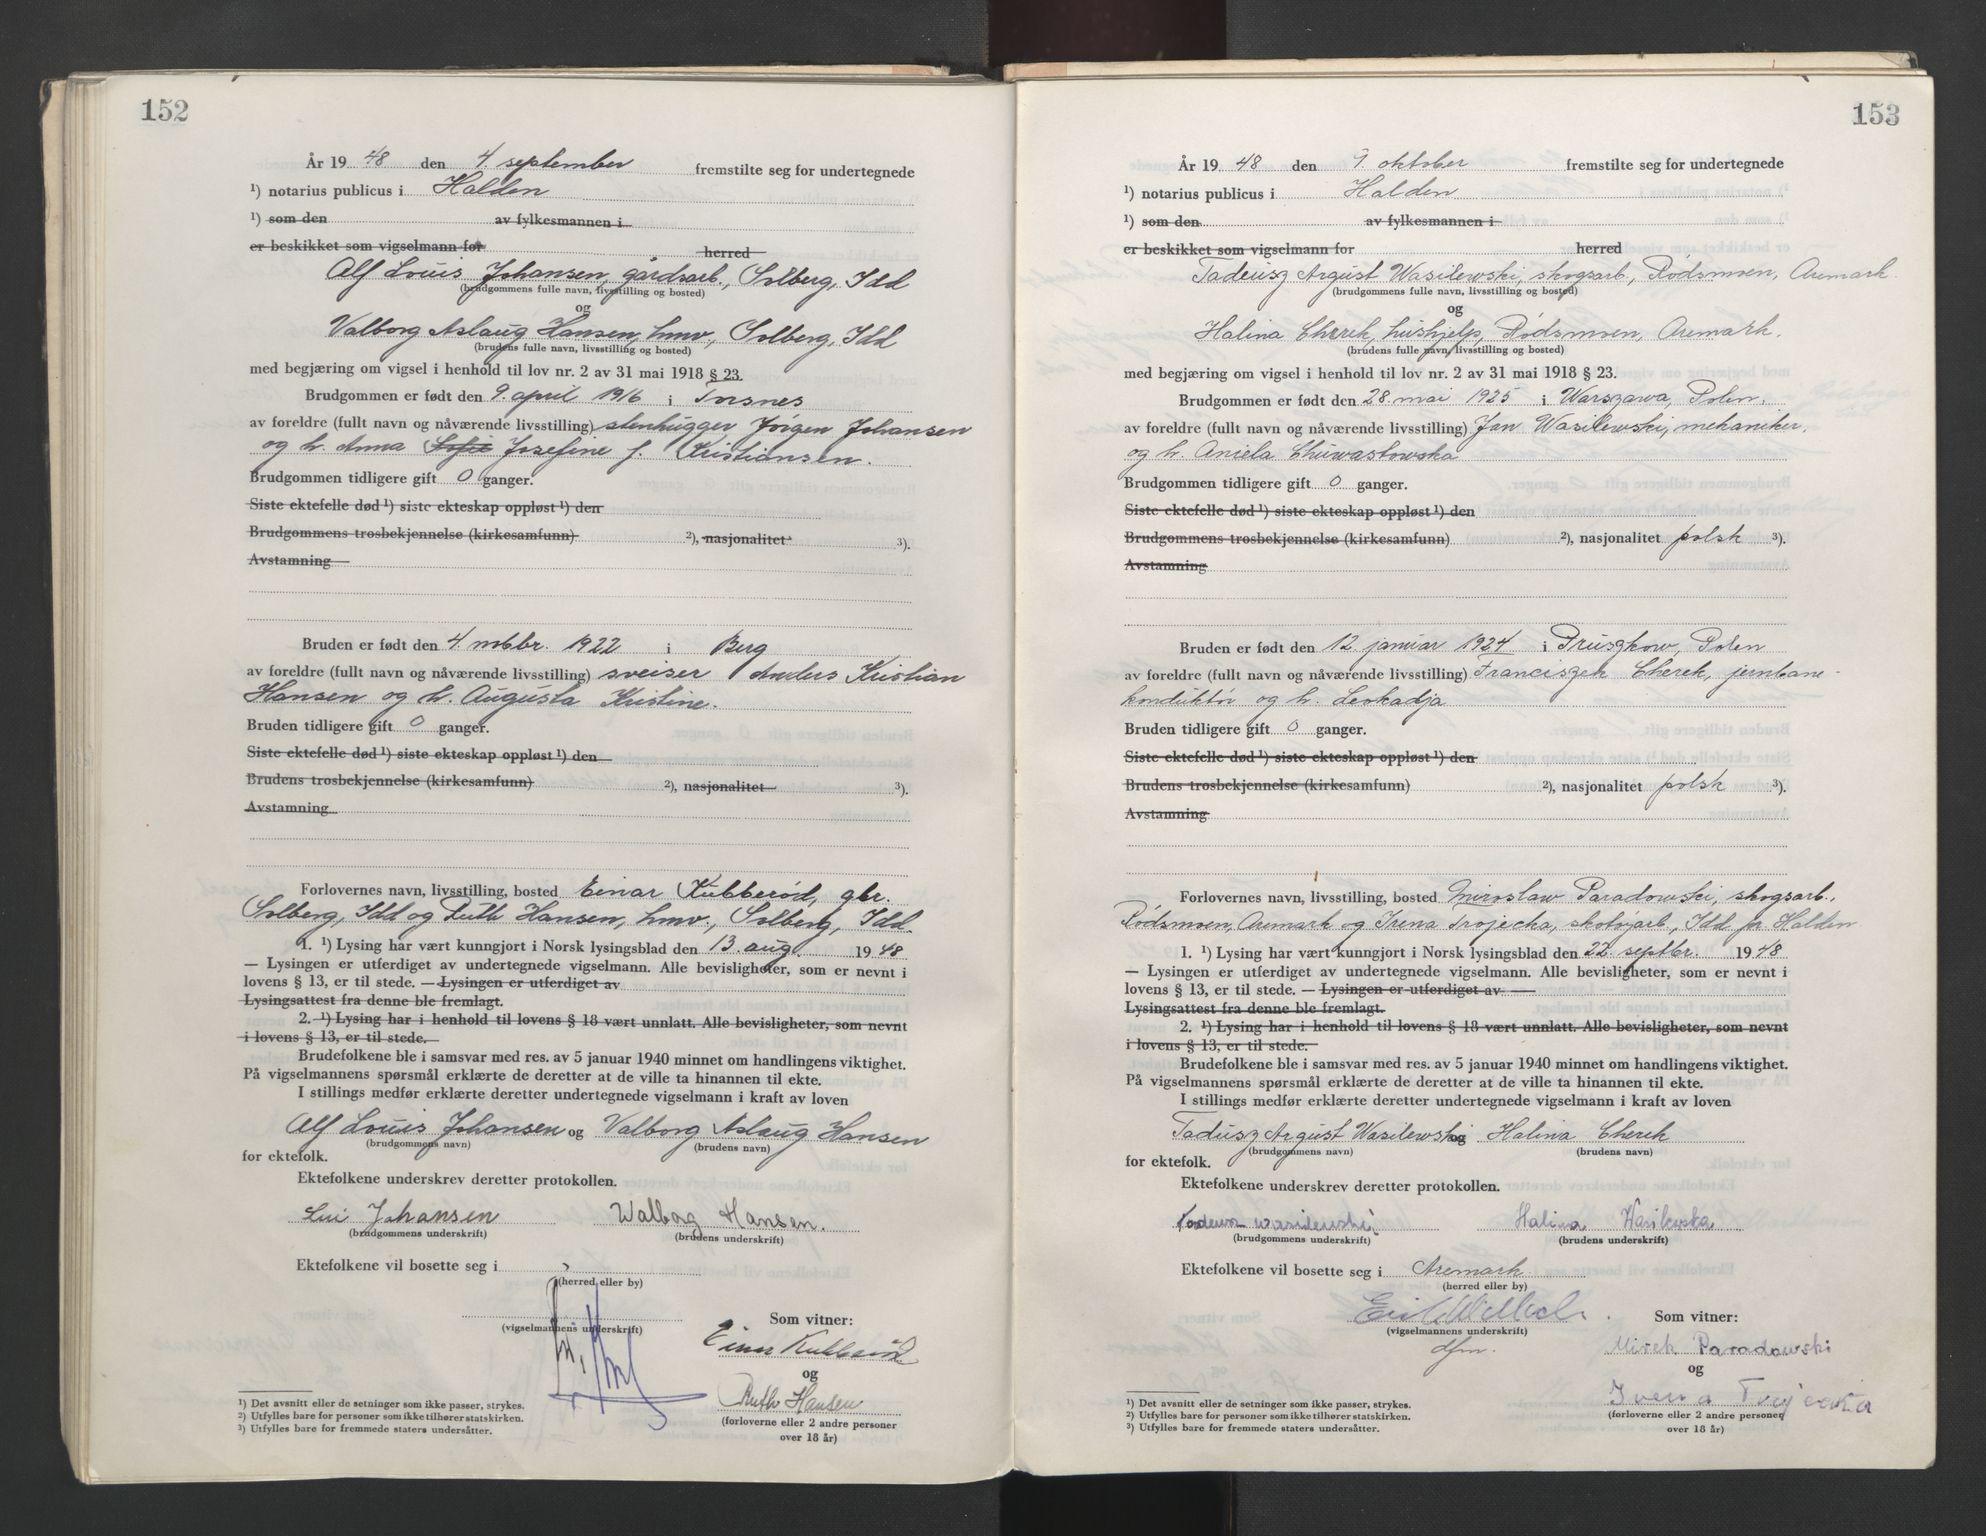 SAO, Idd og Marker sorenskriveri, L/Lc/L0001: Vigselsbøker, 1945-1949, s. 152-153